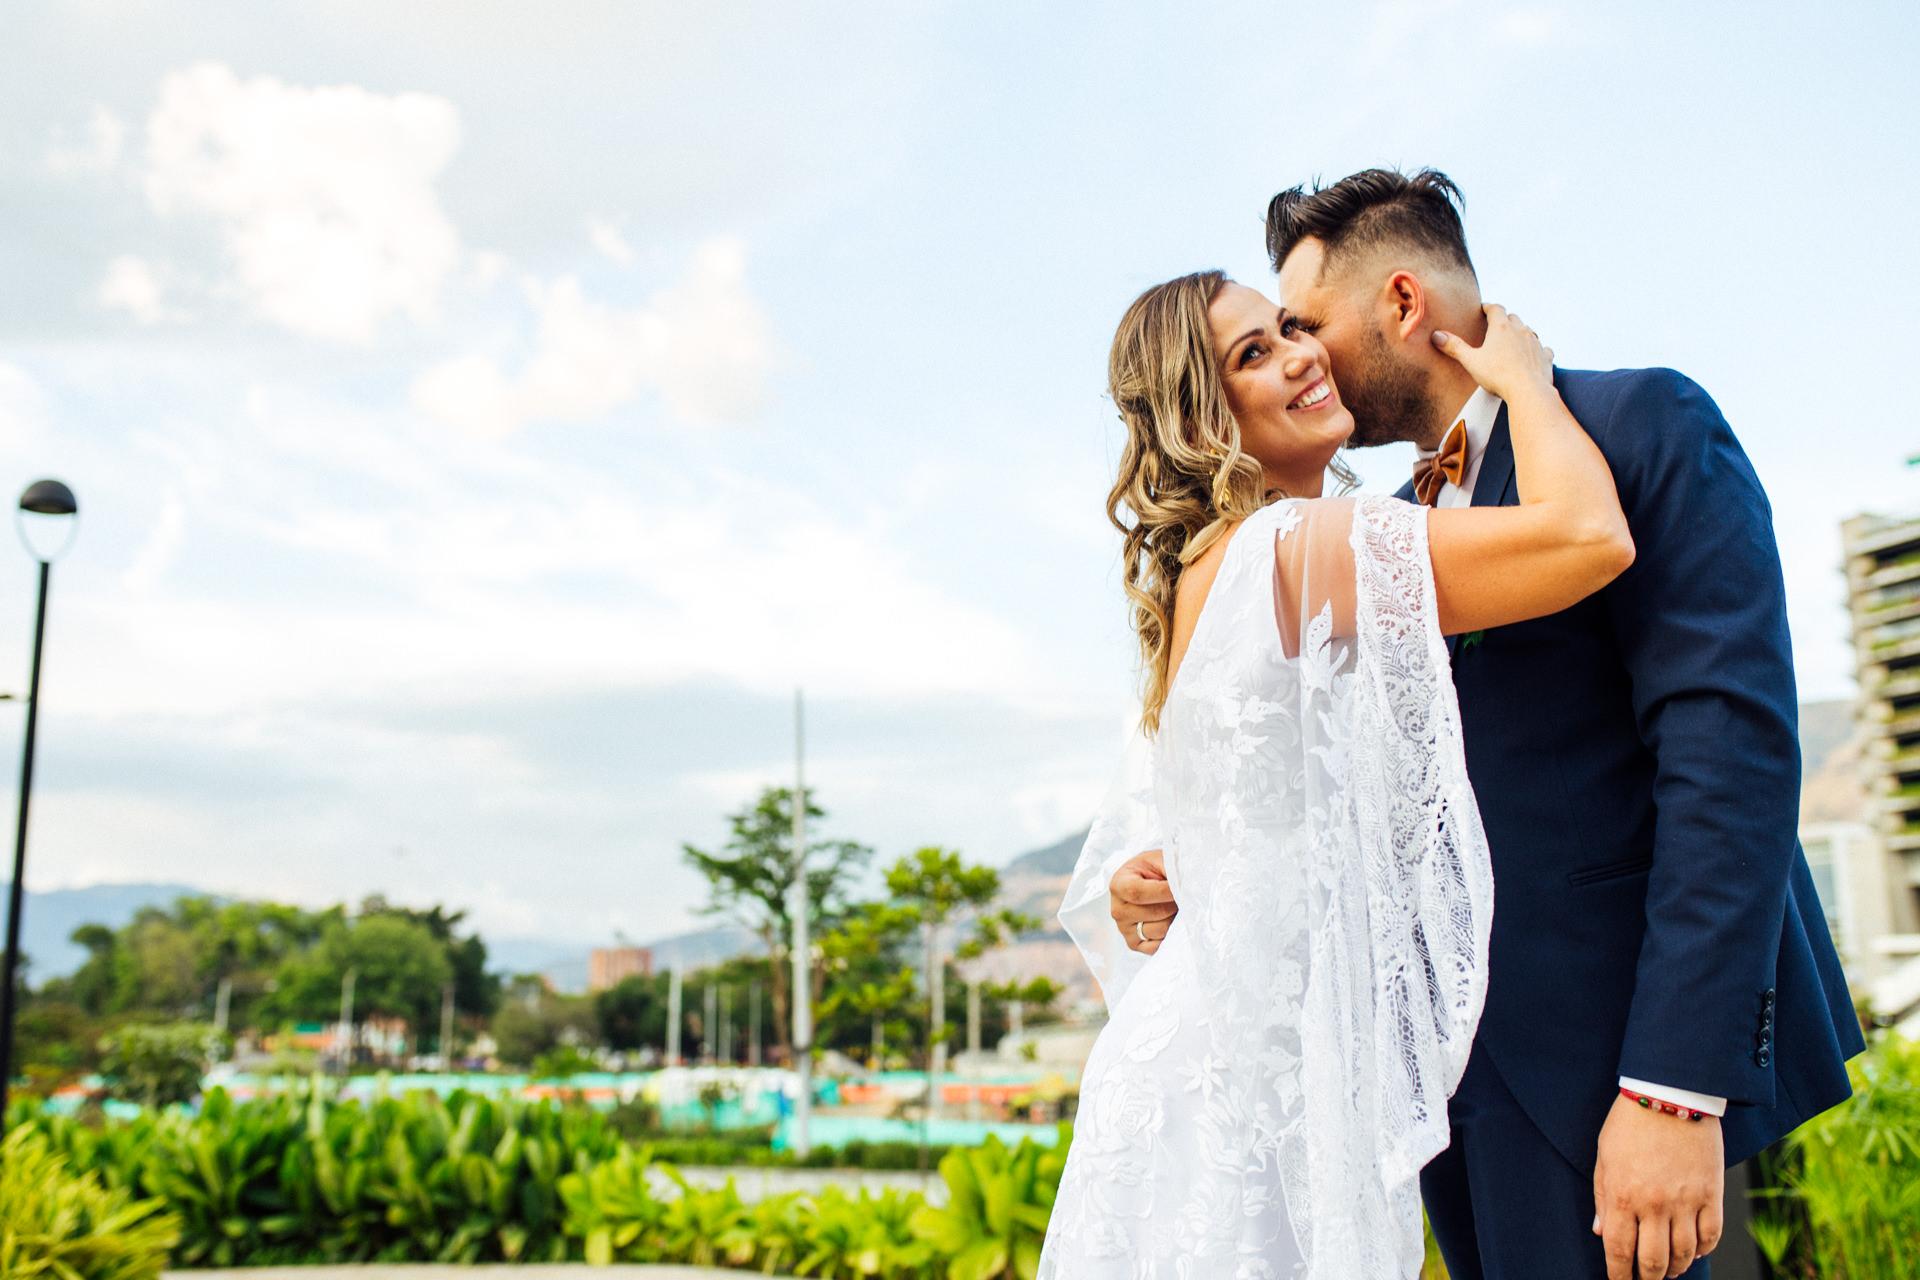 Wedding-Boda-Matrimonio-Fotografo-Fotografia-bodas-Medellin-Llanogrande-Colombia-Bogota-Cartagena-Miami-Wed-Destination-Photojournalism (159).JPG